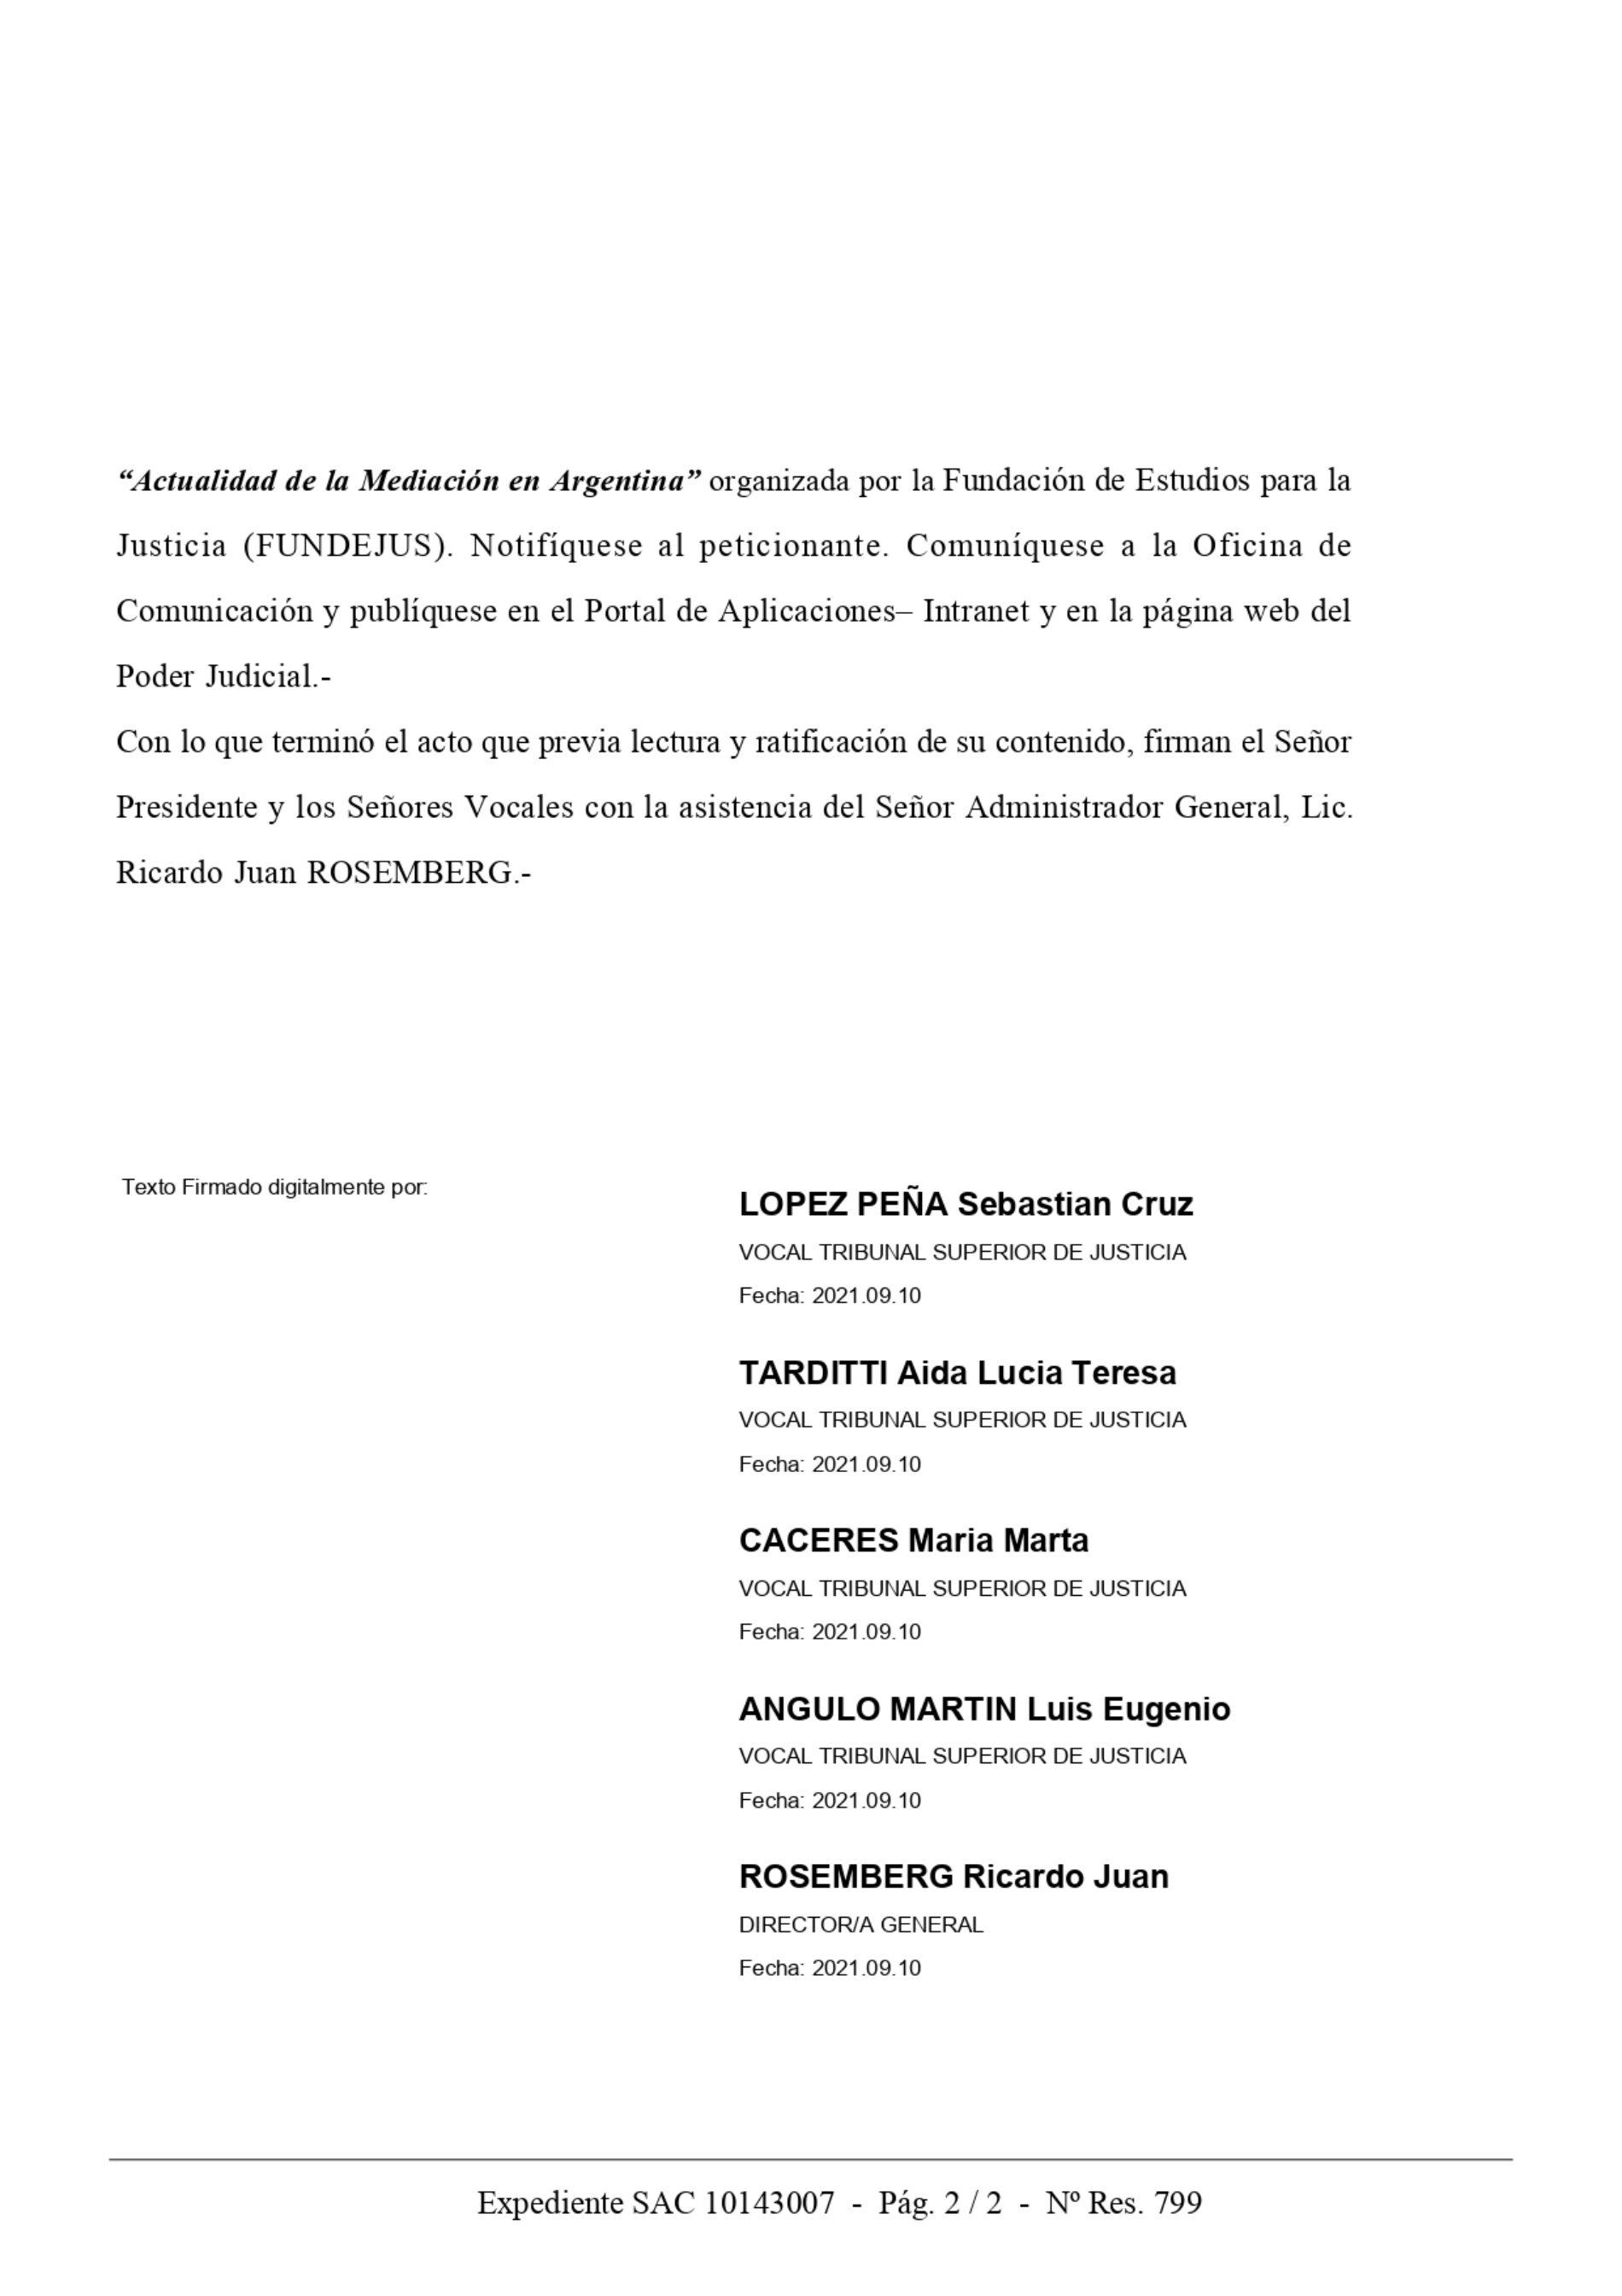 Declaración de interés: Tribunal Superior de Justicia de Córdoba (Ac. 799/2021).